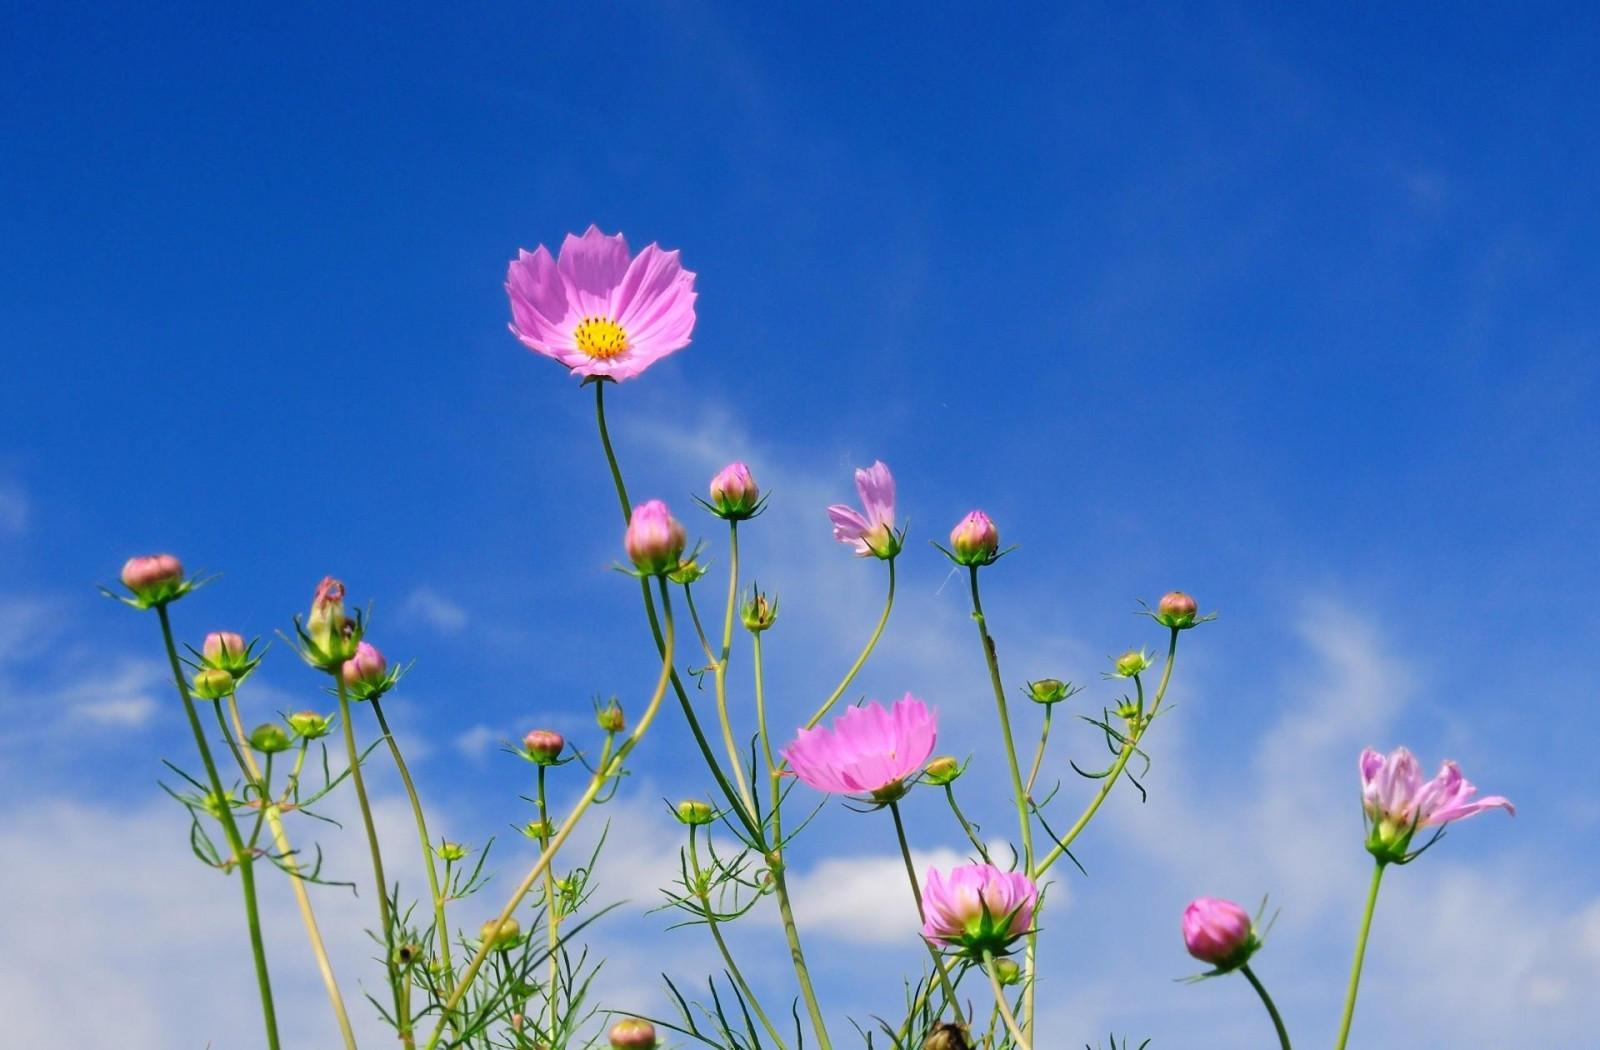 Картинки днем, картинки цветы на фоне неба